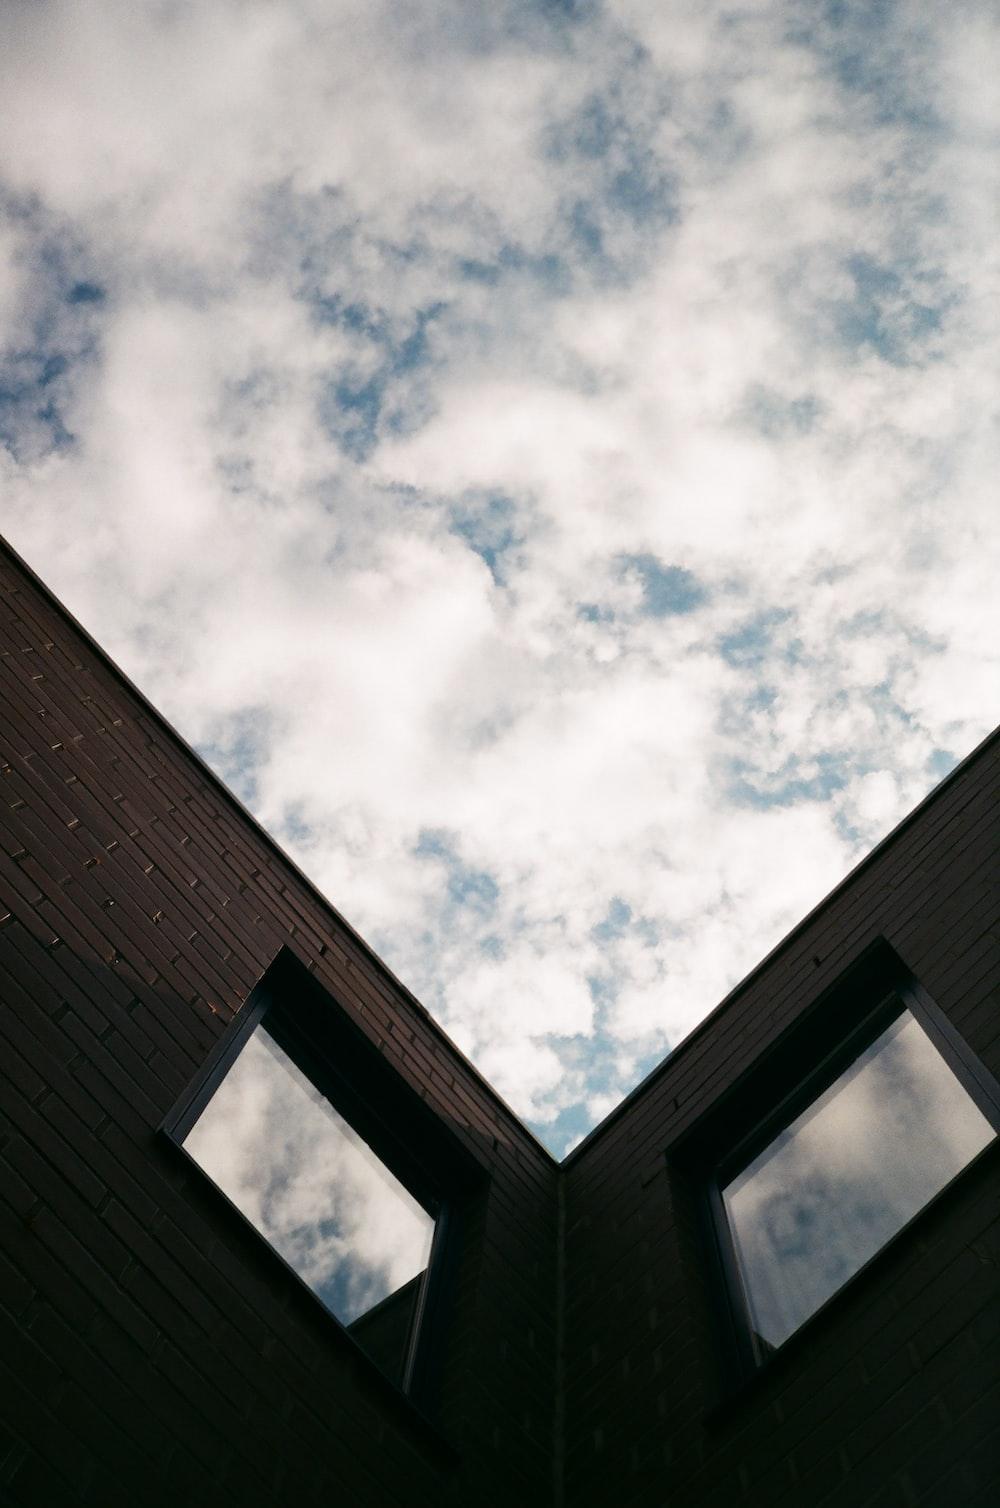 brown brick building under white clouds during daytime